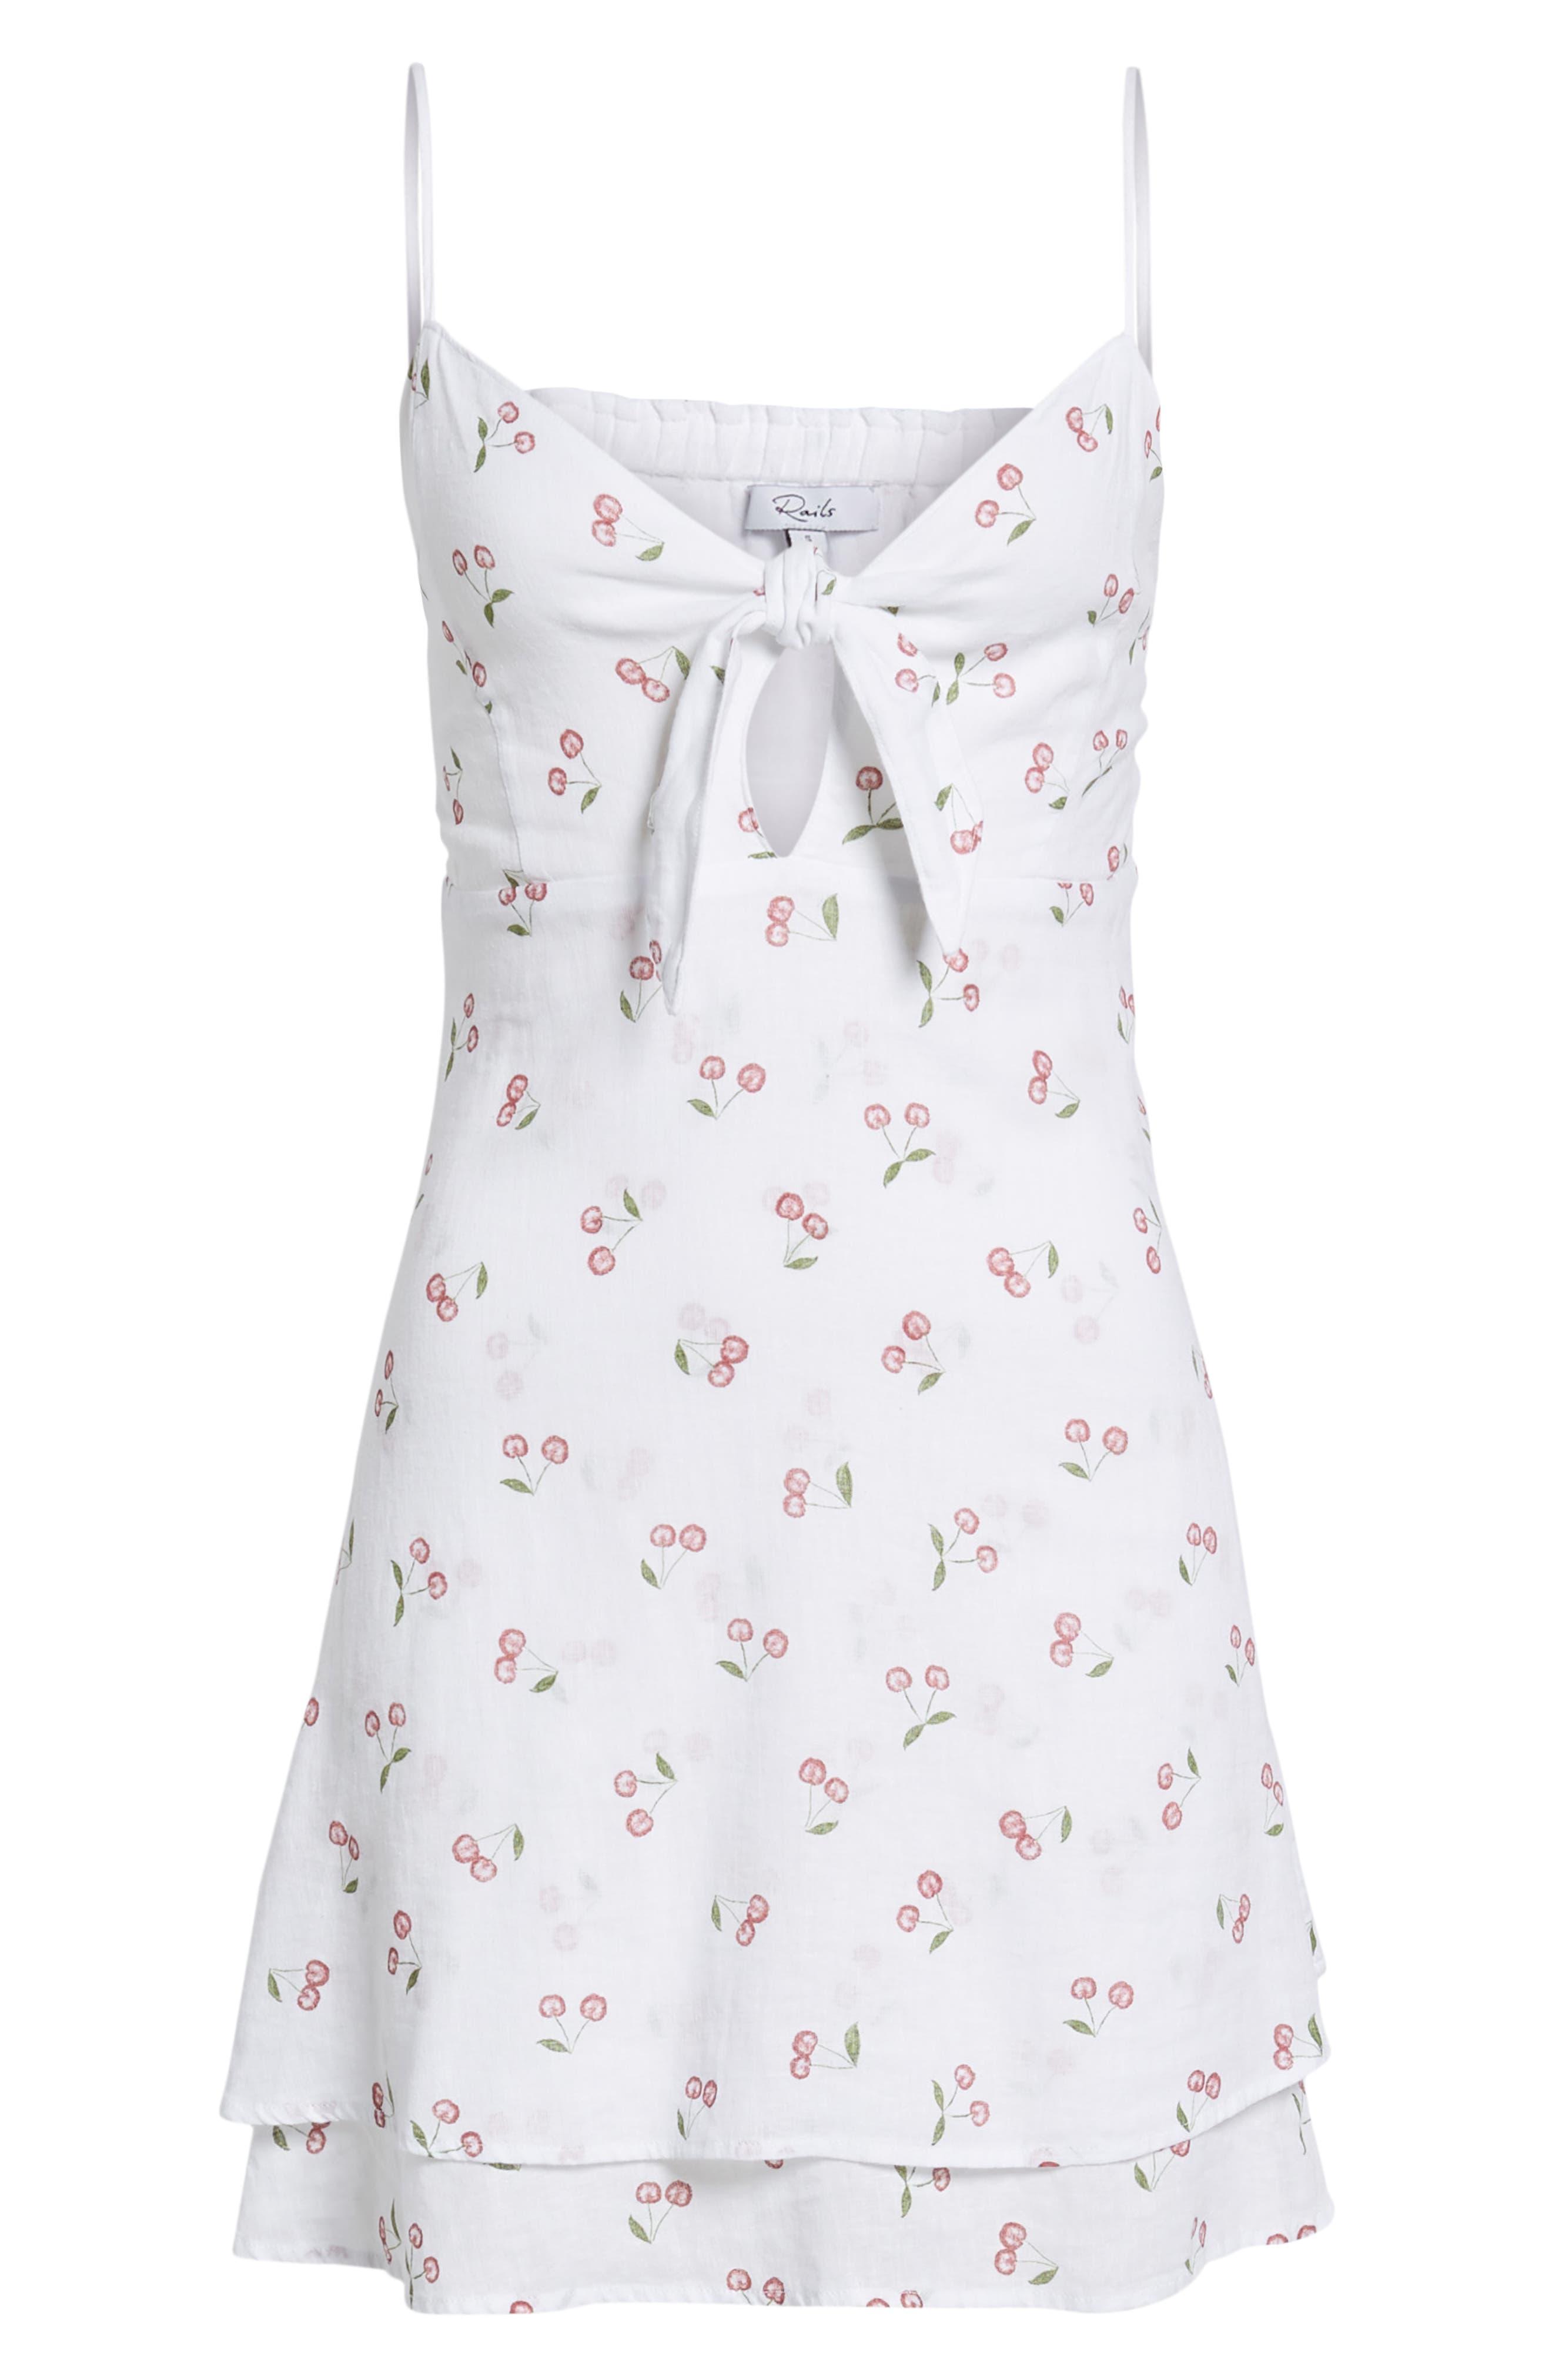 August Daisy Tie Front Dress,                             Alternate thumbnail 7, color,                             WHITE CHERRIES